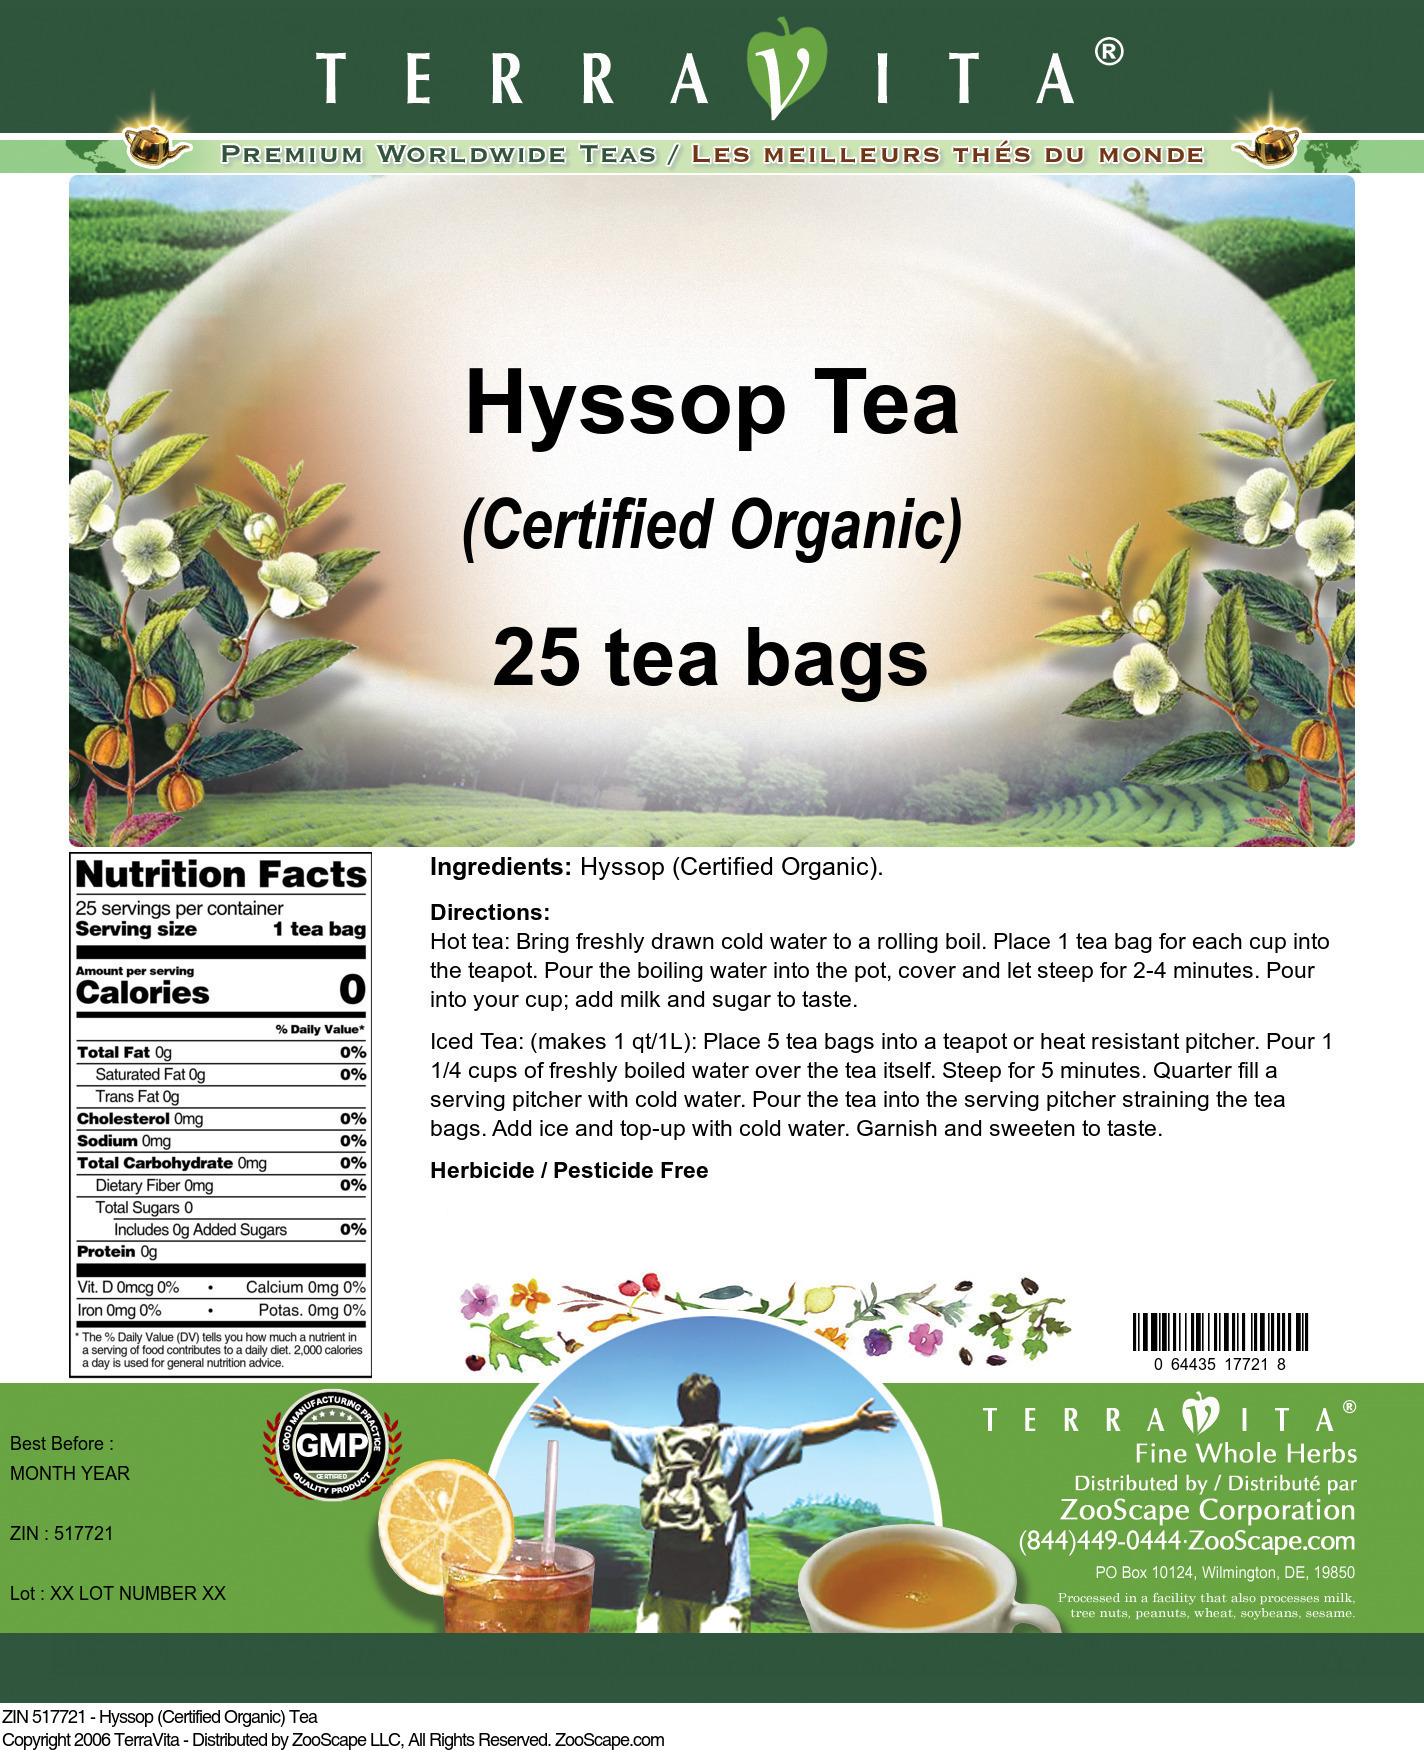 Hyssop (Certified Organic) Tea